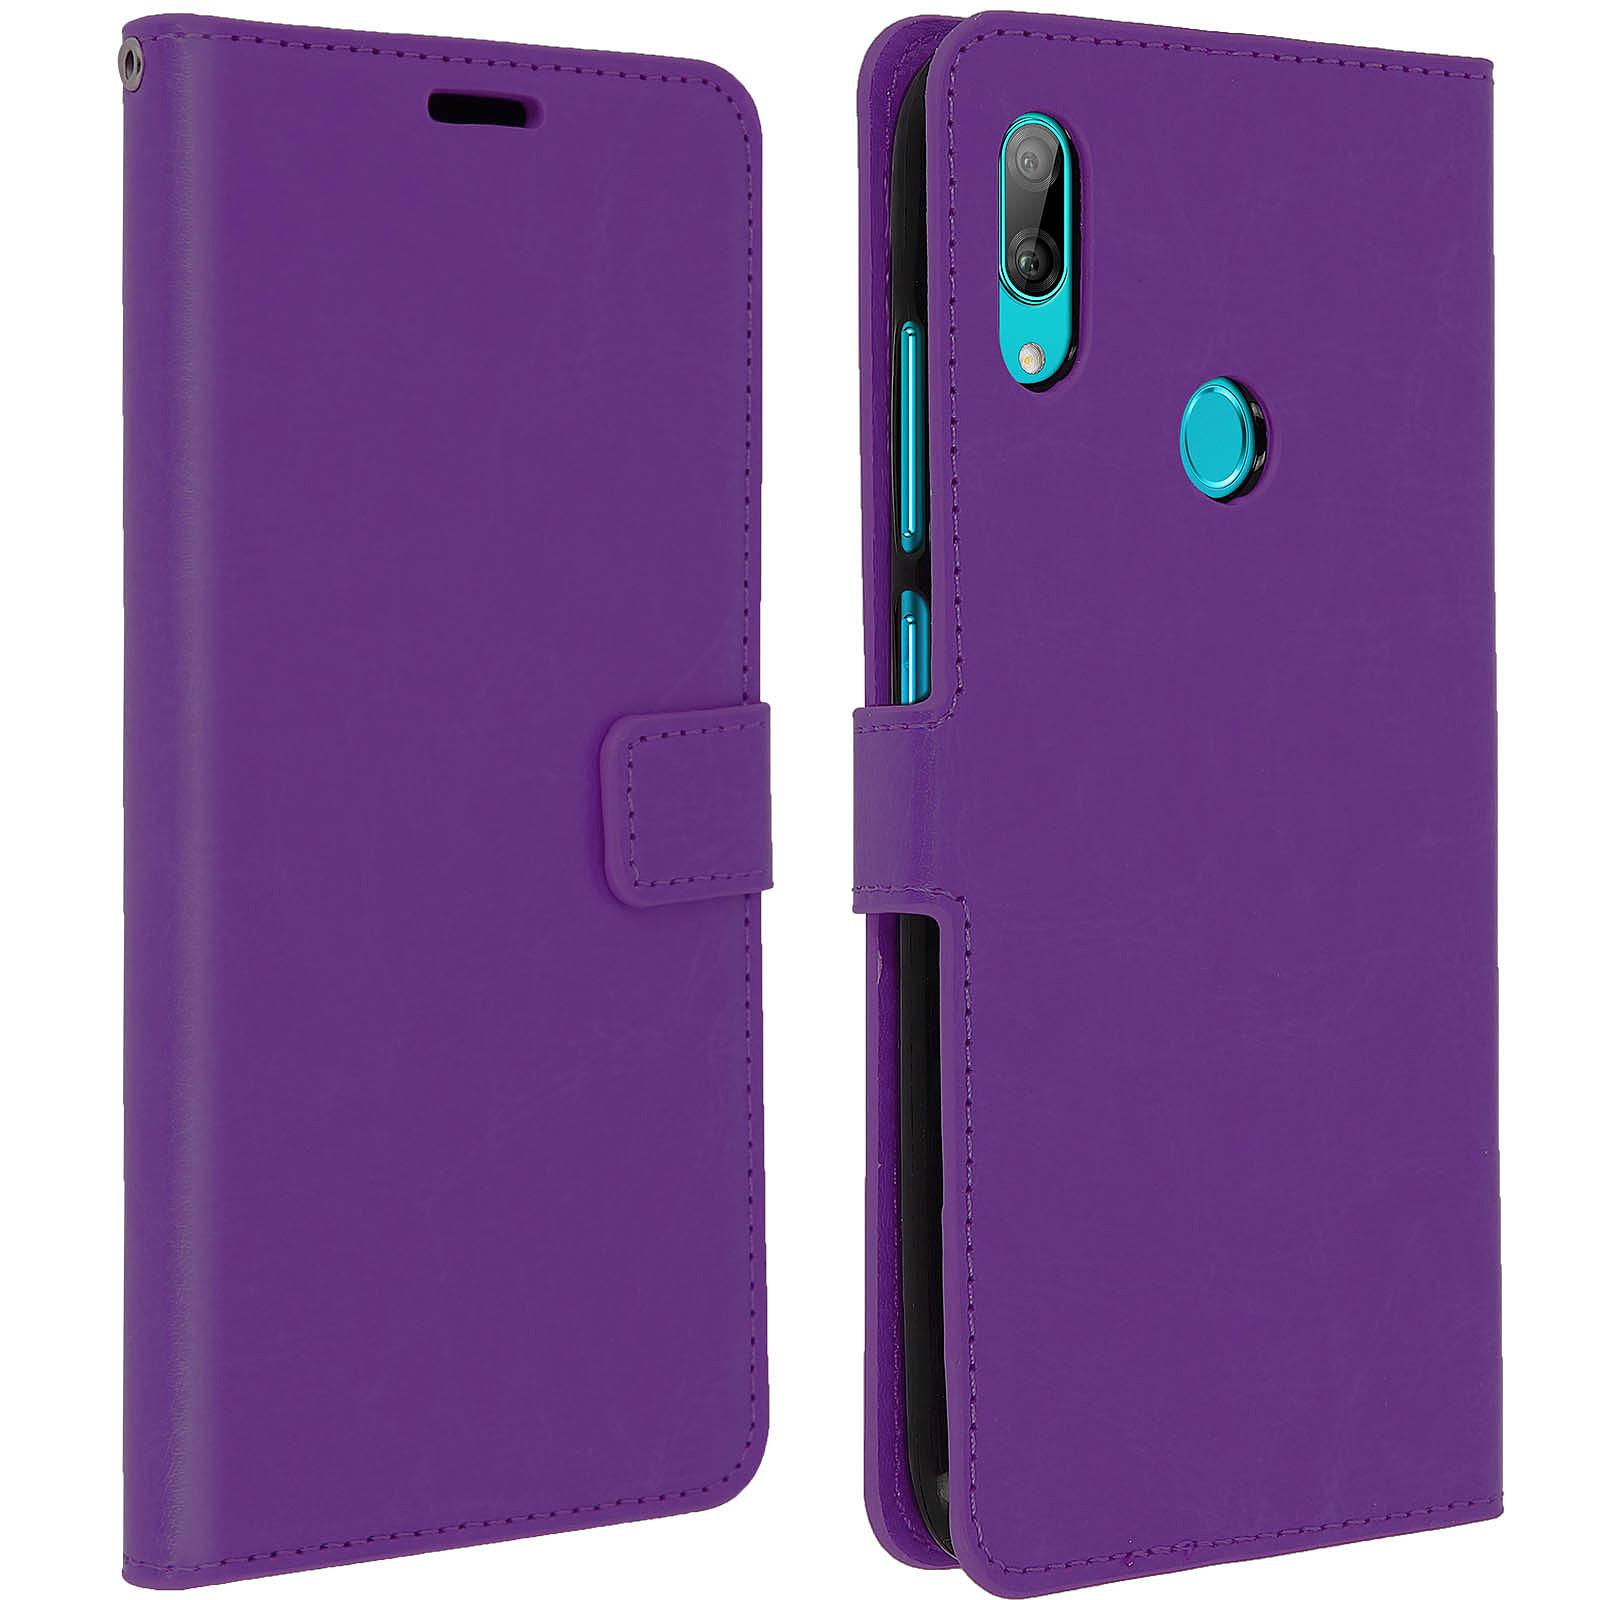 Avizar Etui folio Violet pour Huawei Y7 2019